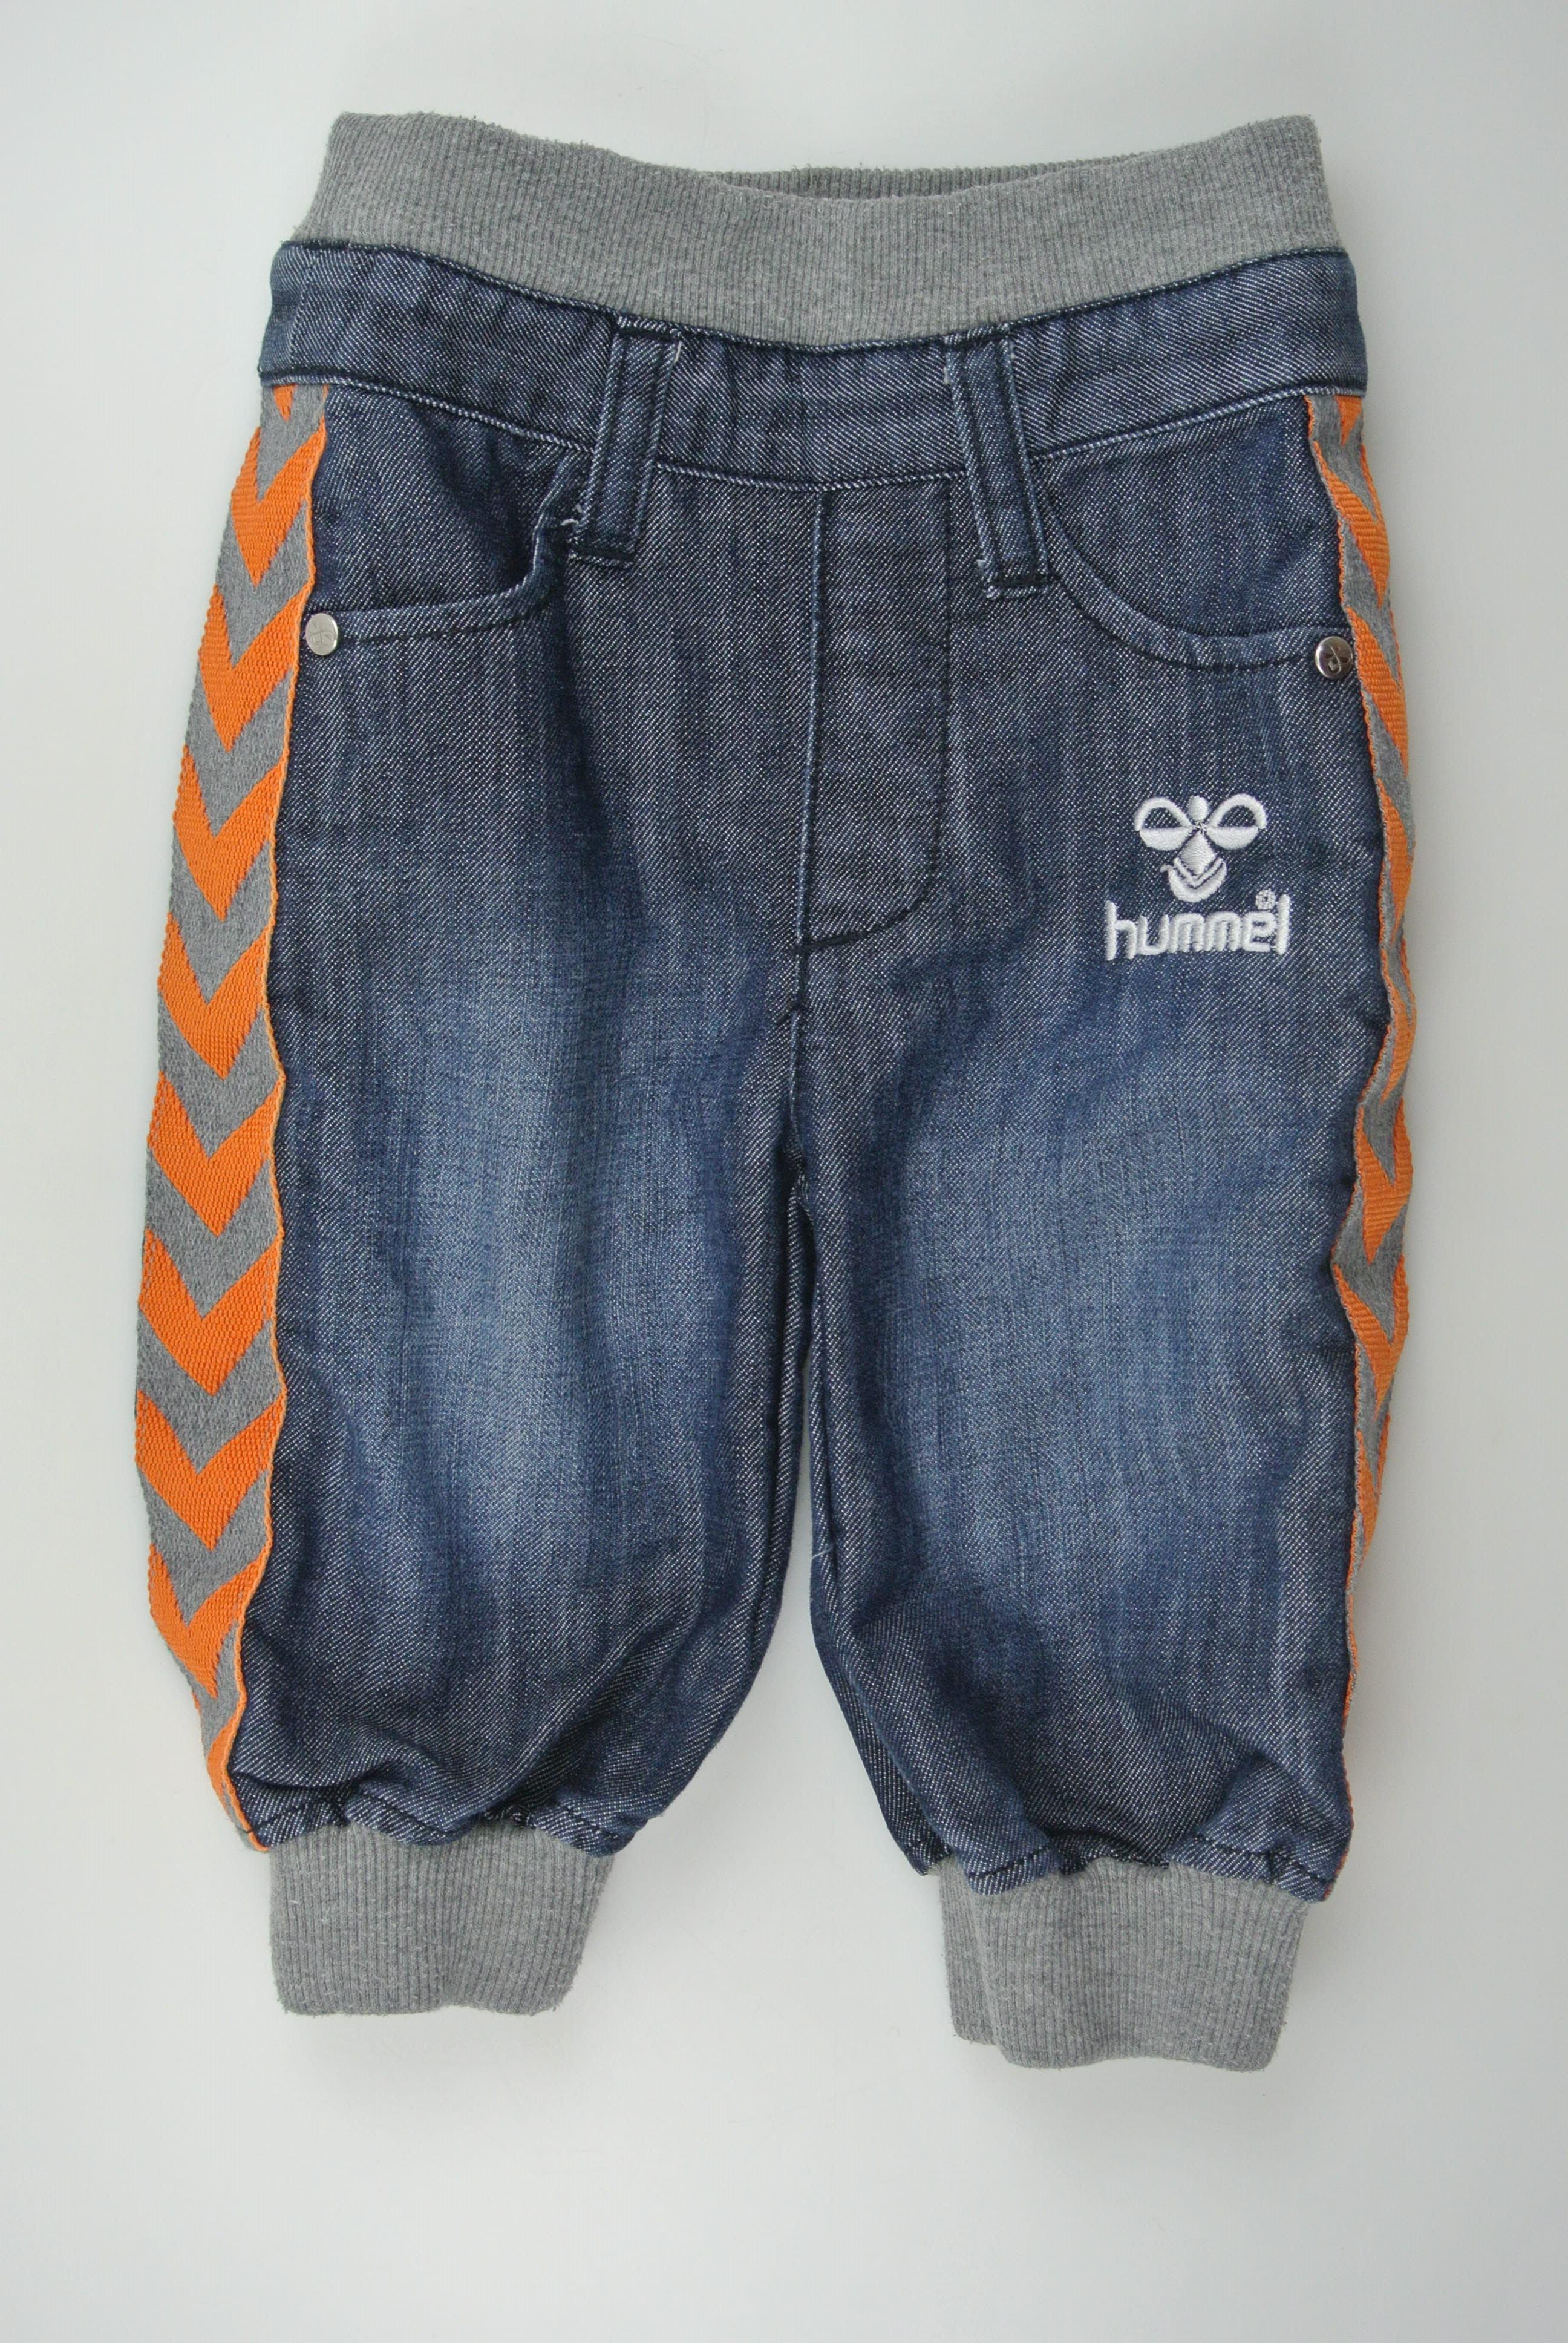 Hummel bukser str 62 dreng